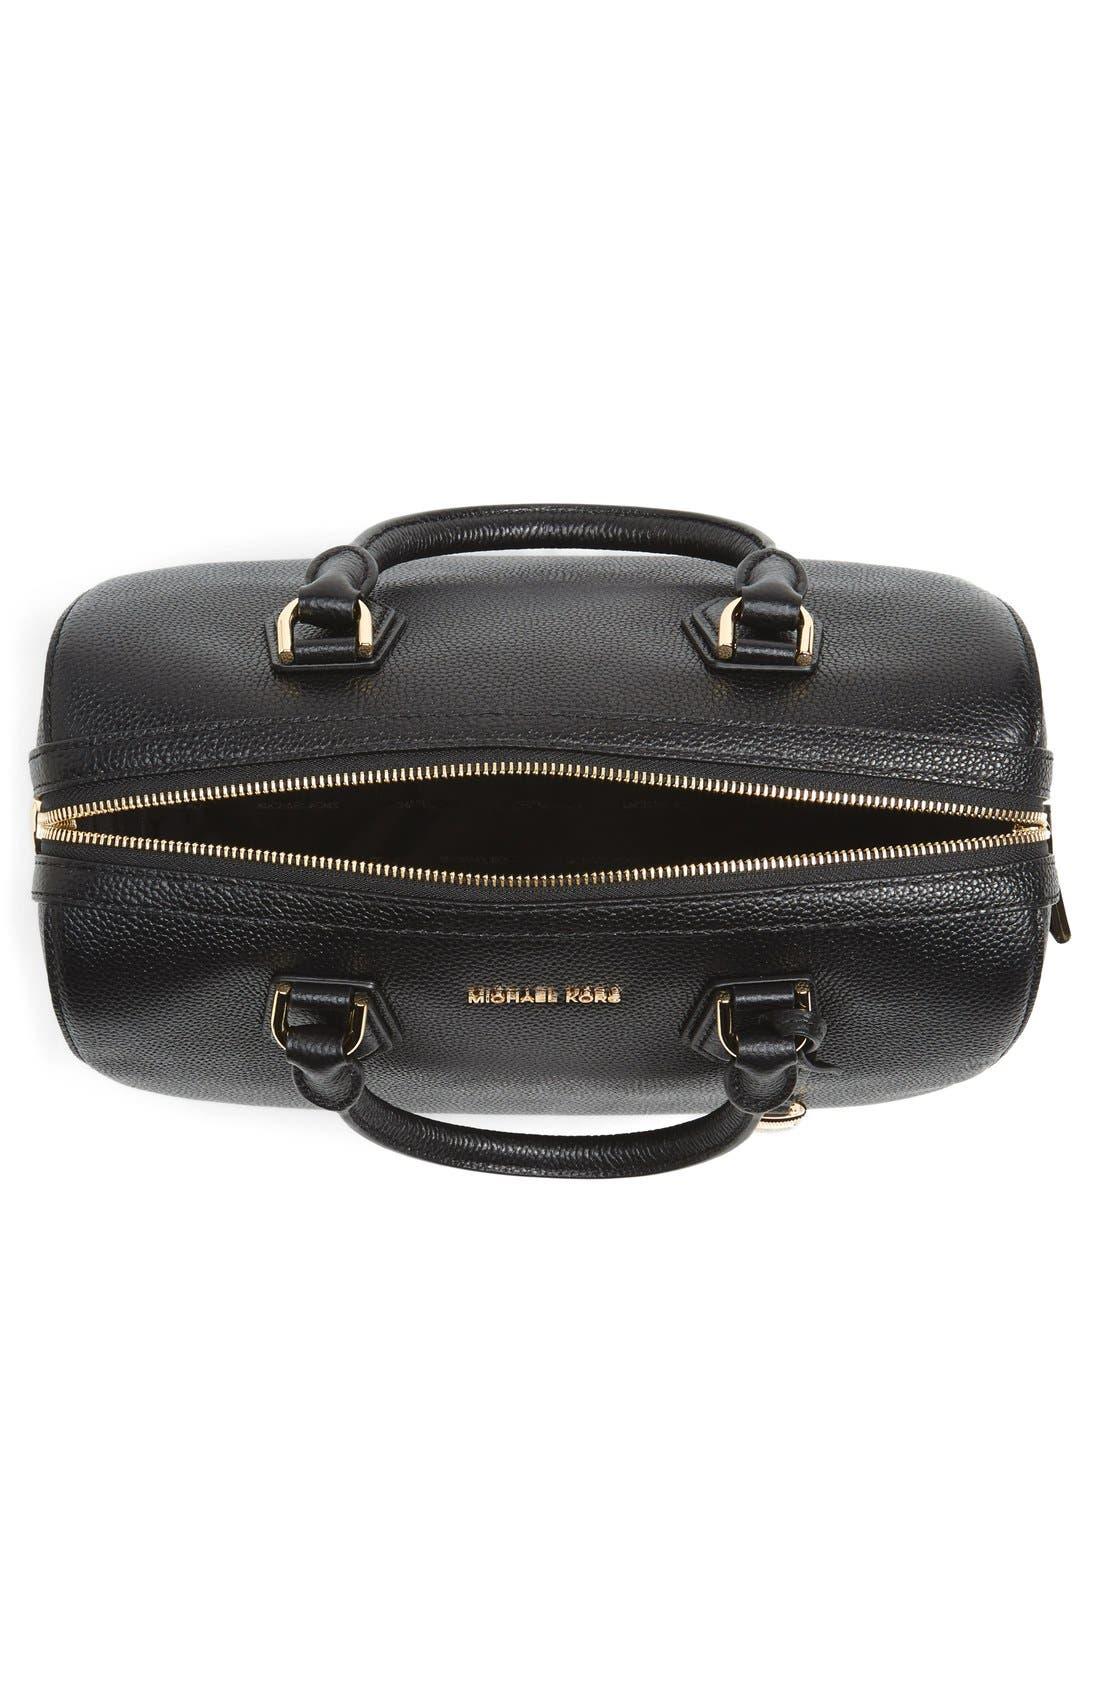 Medium Mercer Duffel Bag,                             Alternate thumbnail 6, color,                             001